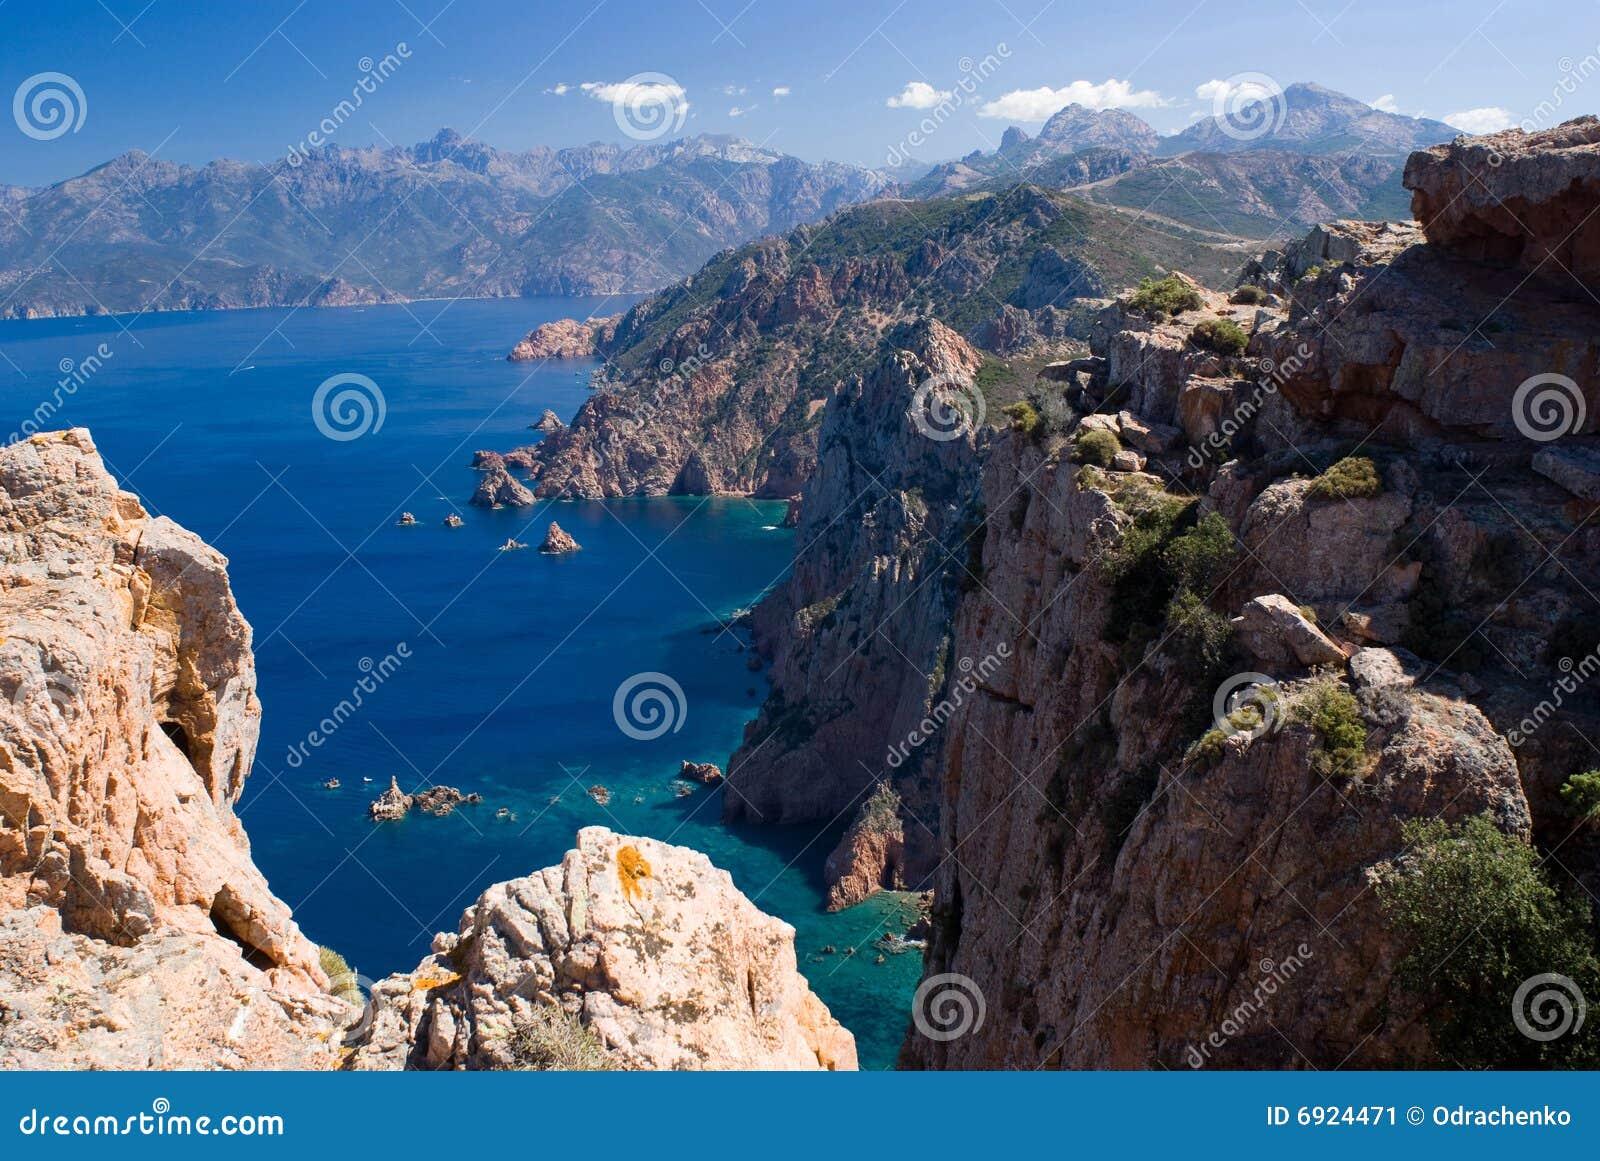 Golf of Porto, Corsica